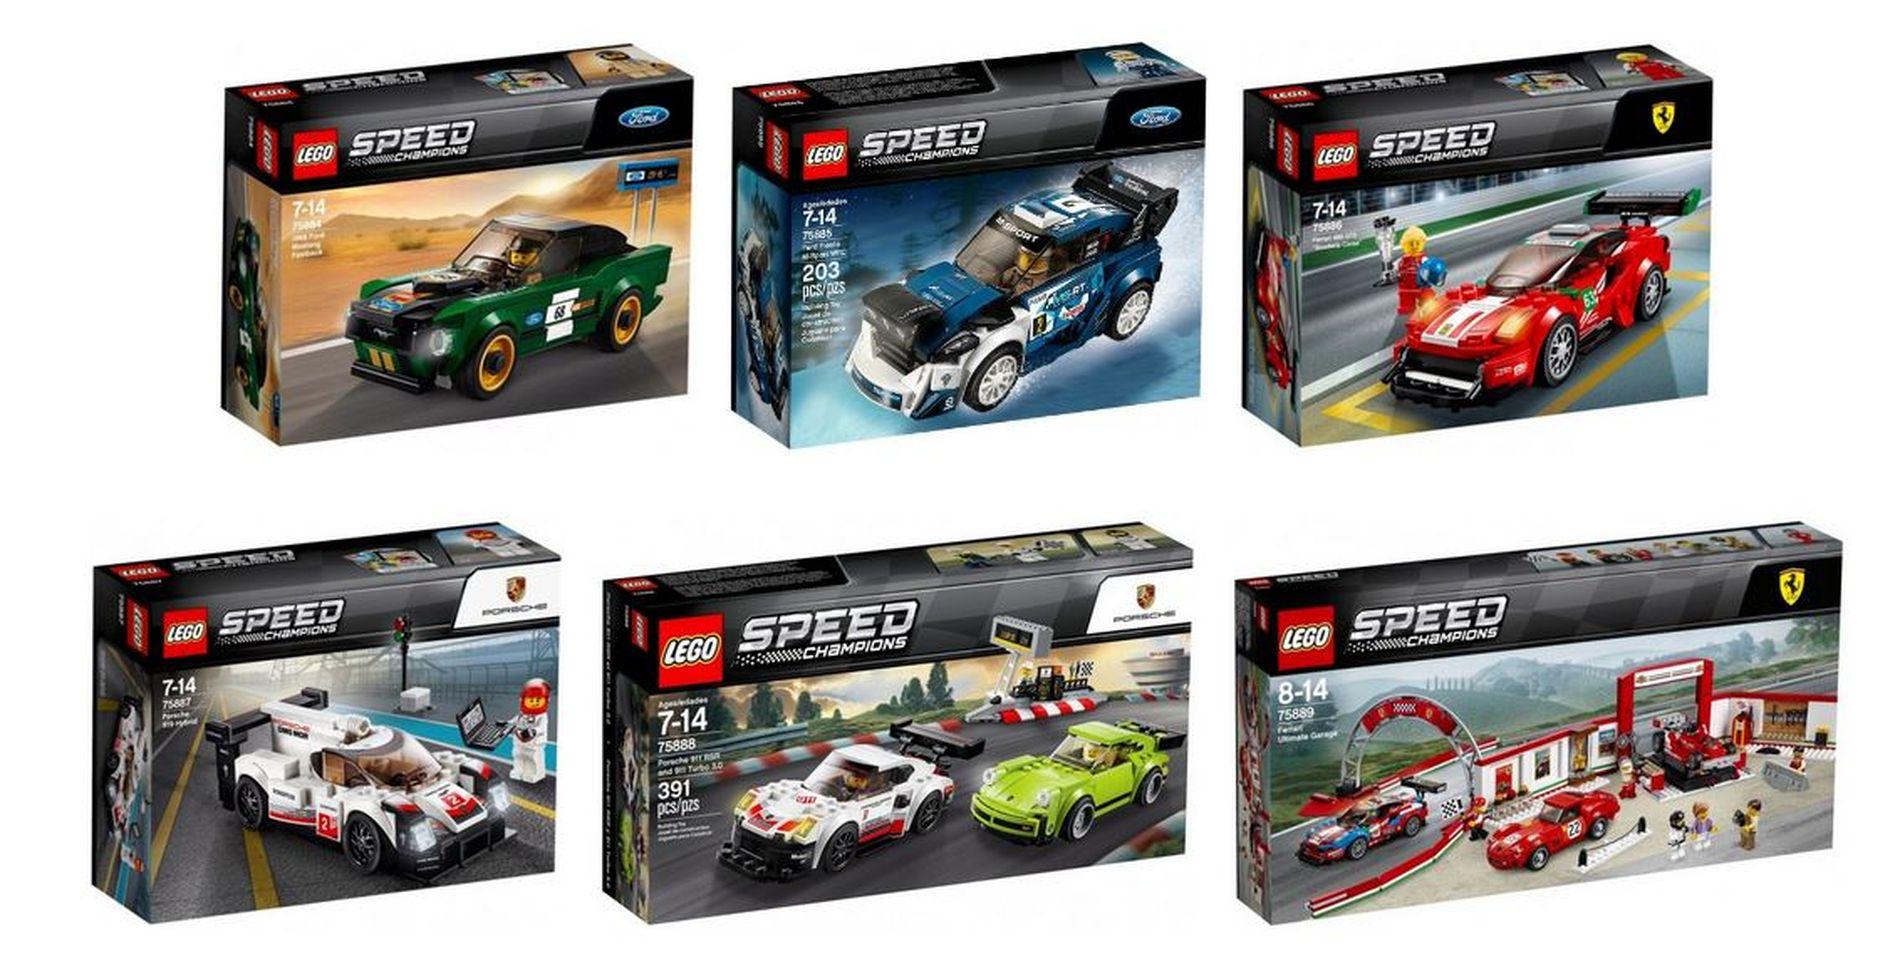 lego speed champions la collection va s 39 agrandir en mars le mag auto prestige. Black Bedroom Furniture Sets. Home Design Ideas